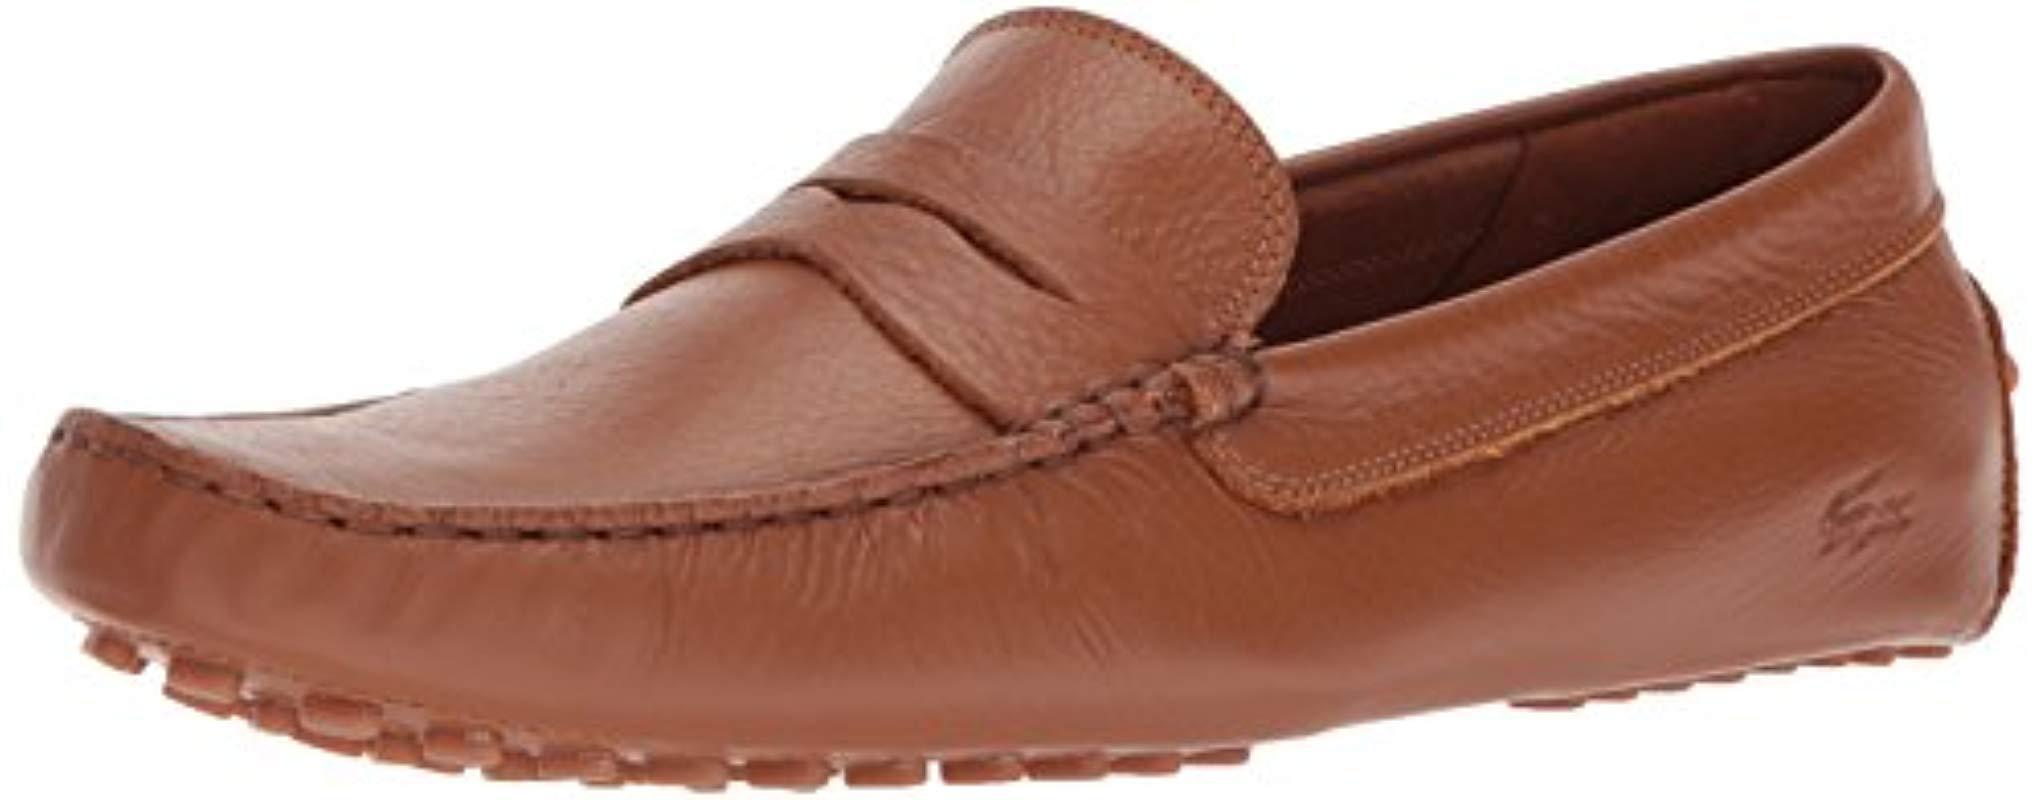 303215e6a3bd Lyst - Lacoste Concours 118 1 P (tan) Men s Shoes in Brown for Men ...